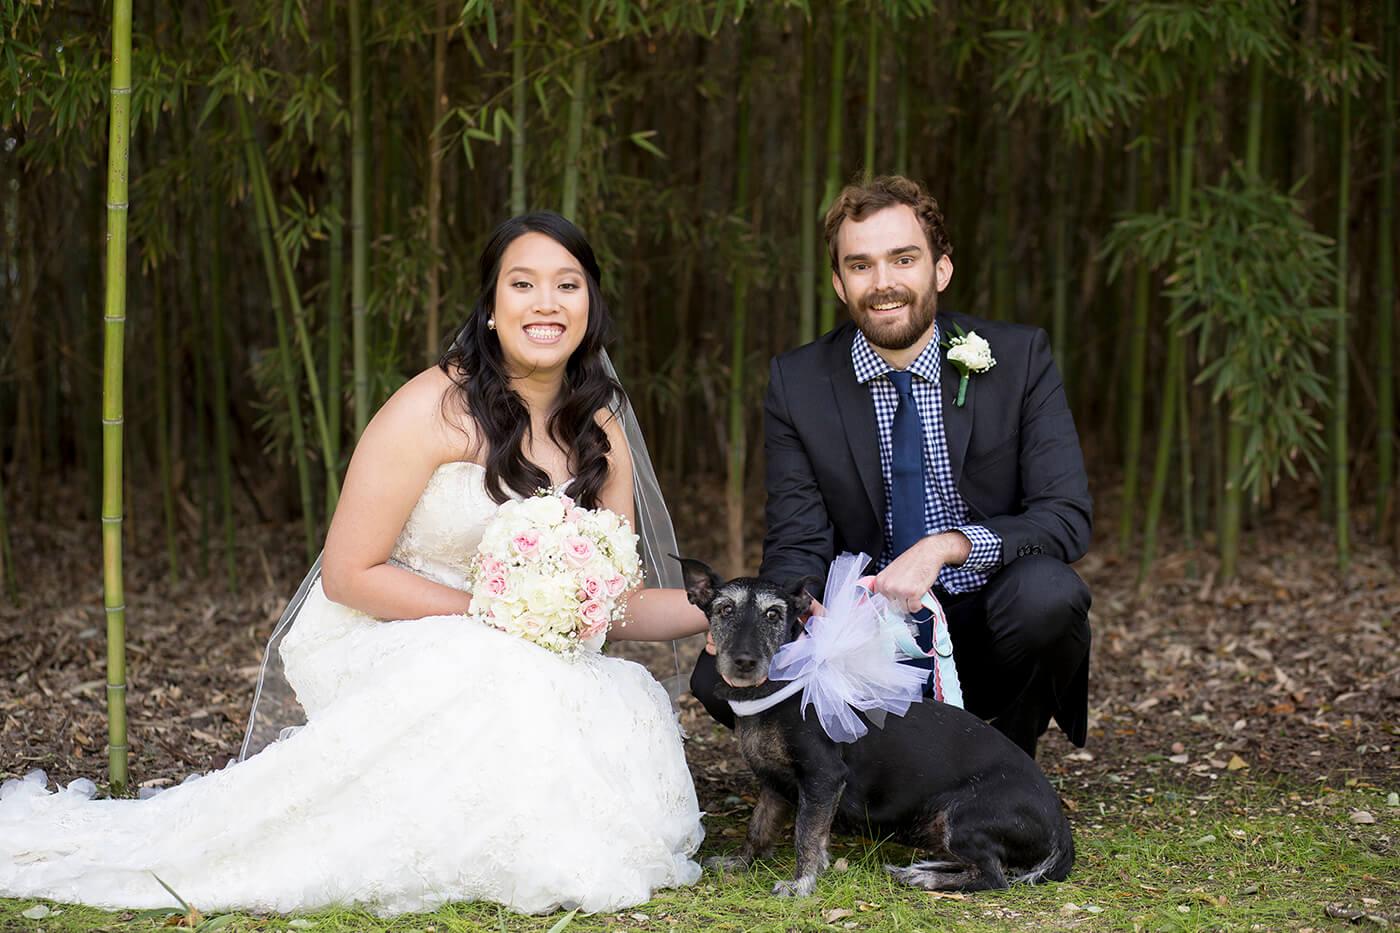 Wedding_Couples_Photographer_Austin_Texas_Dennis_Burnett_31